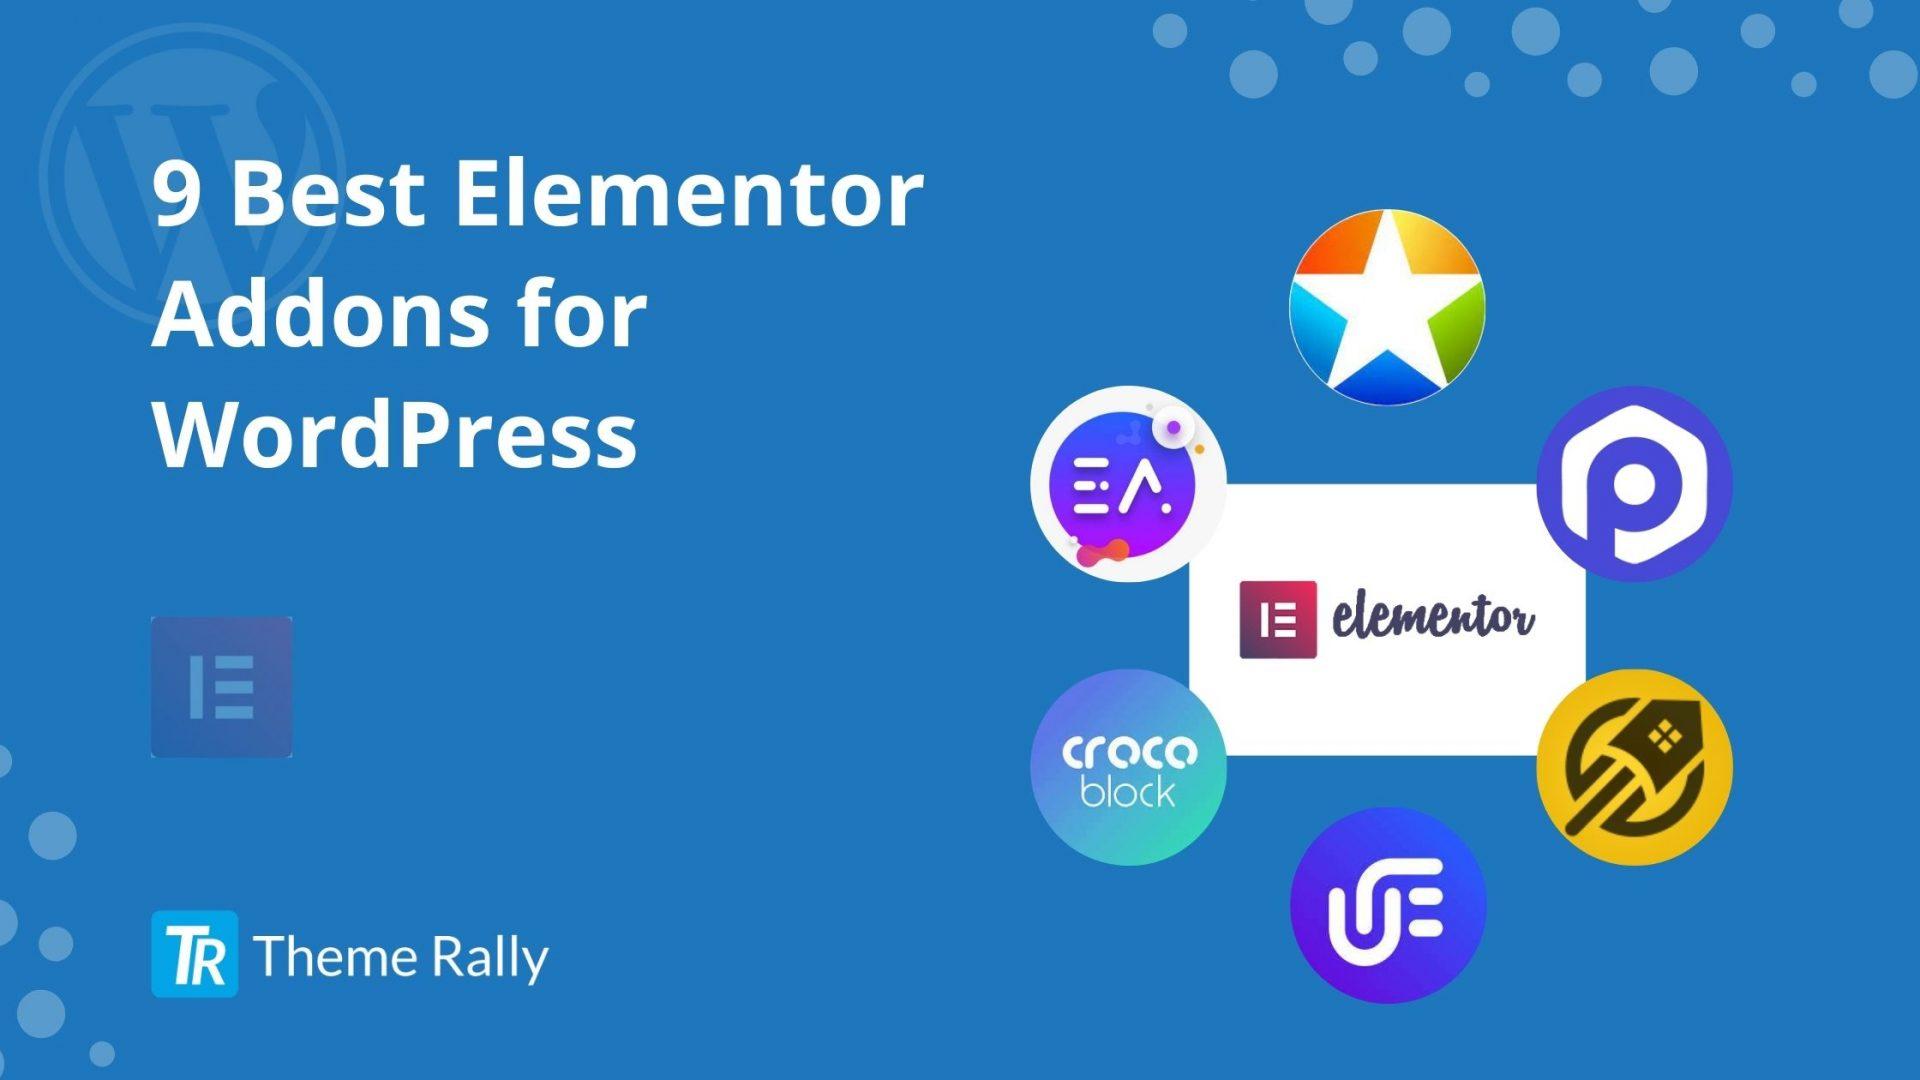 9 Best Elementor Addons for WordPress